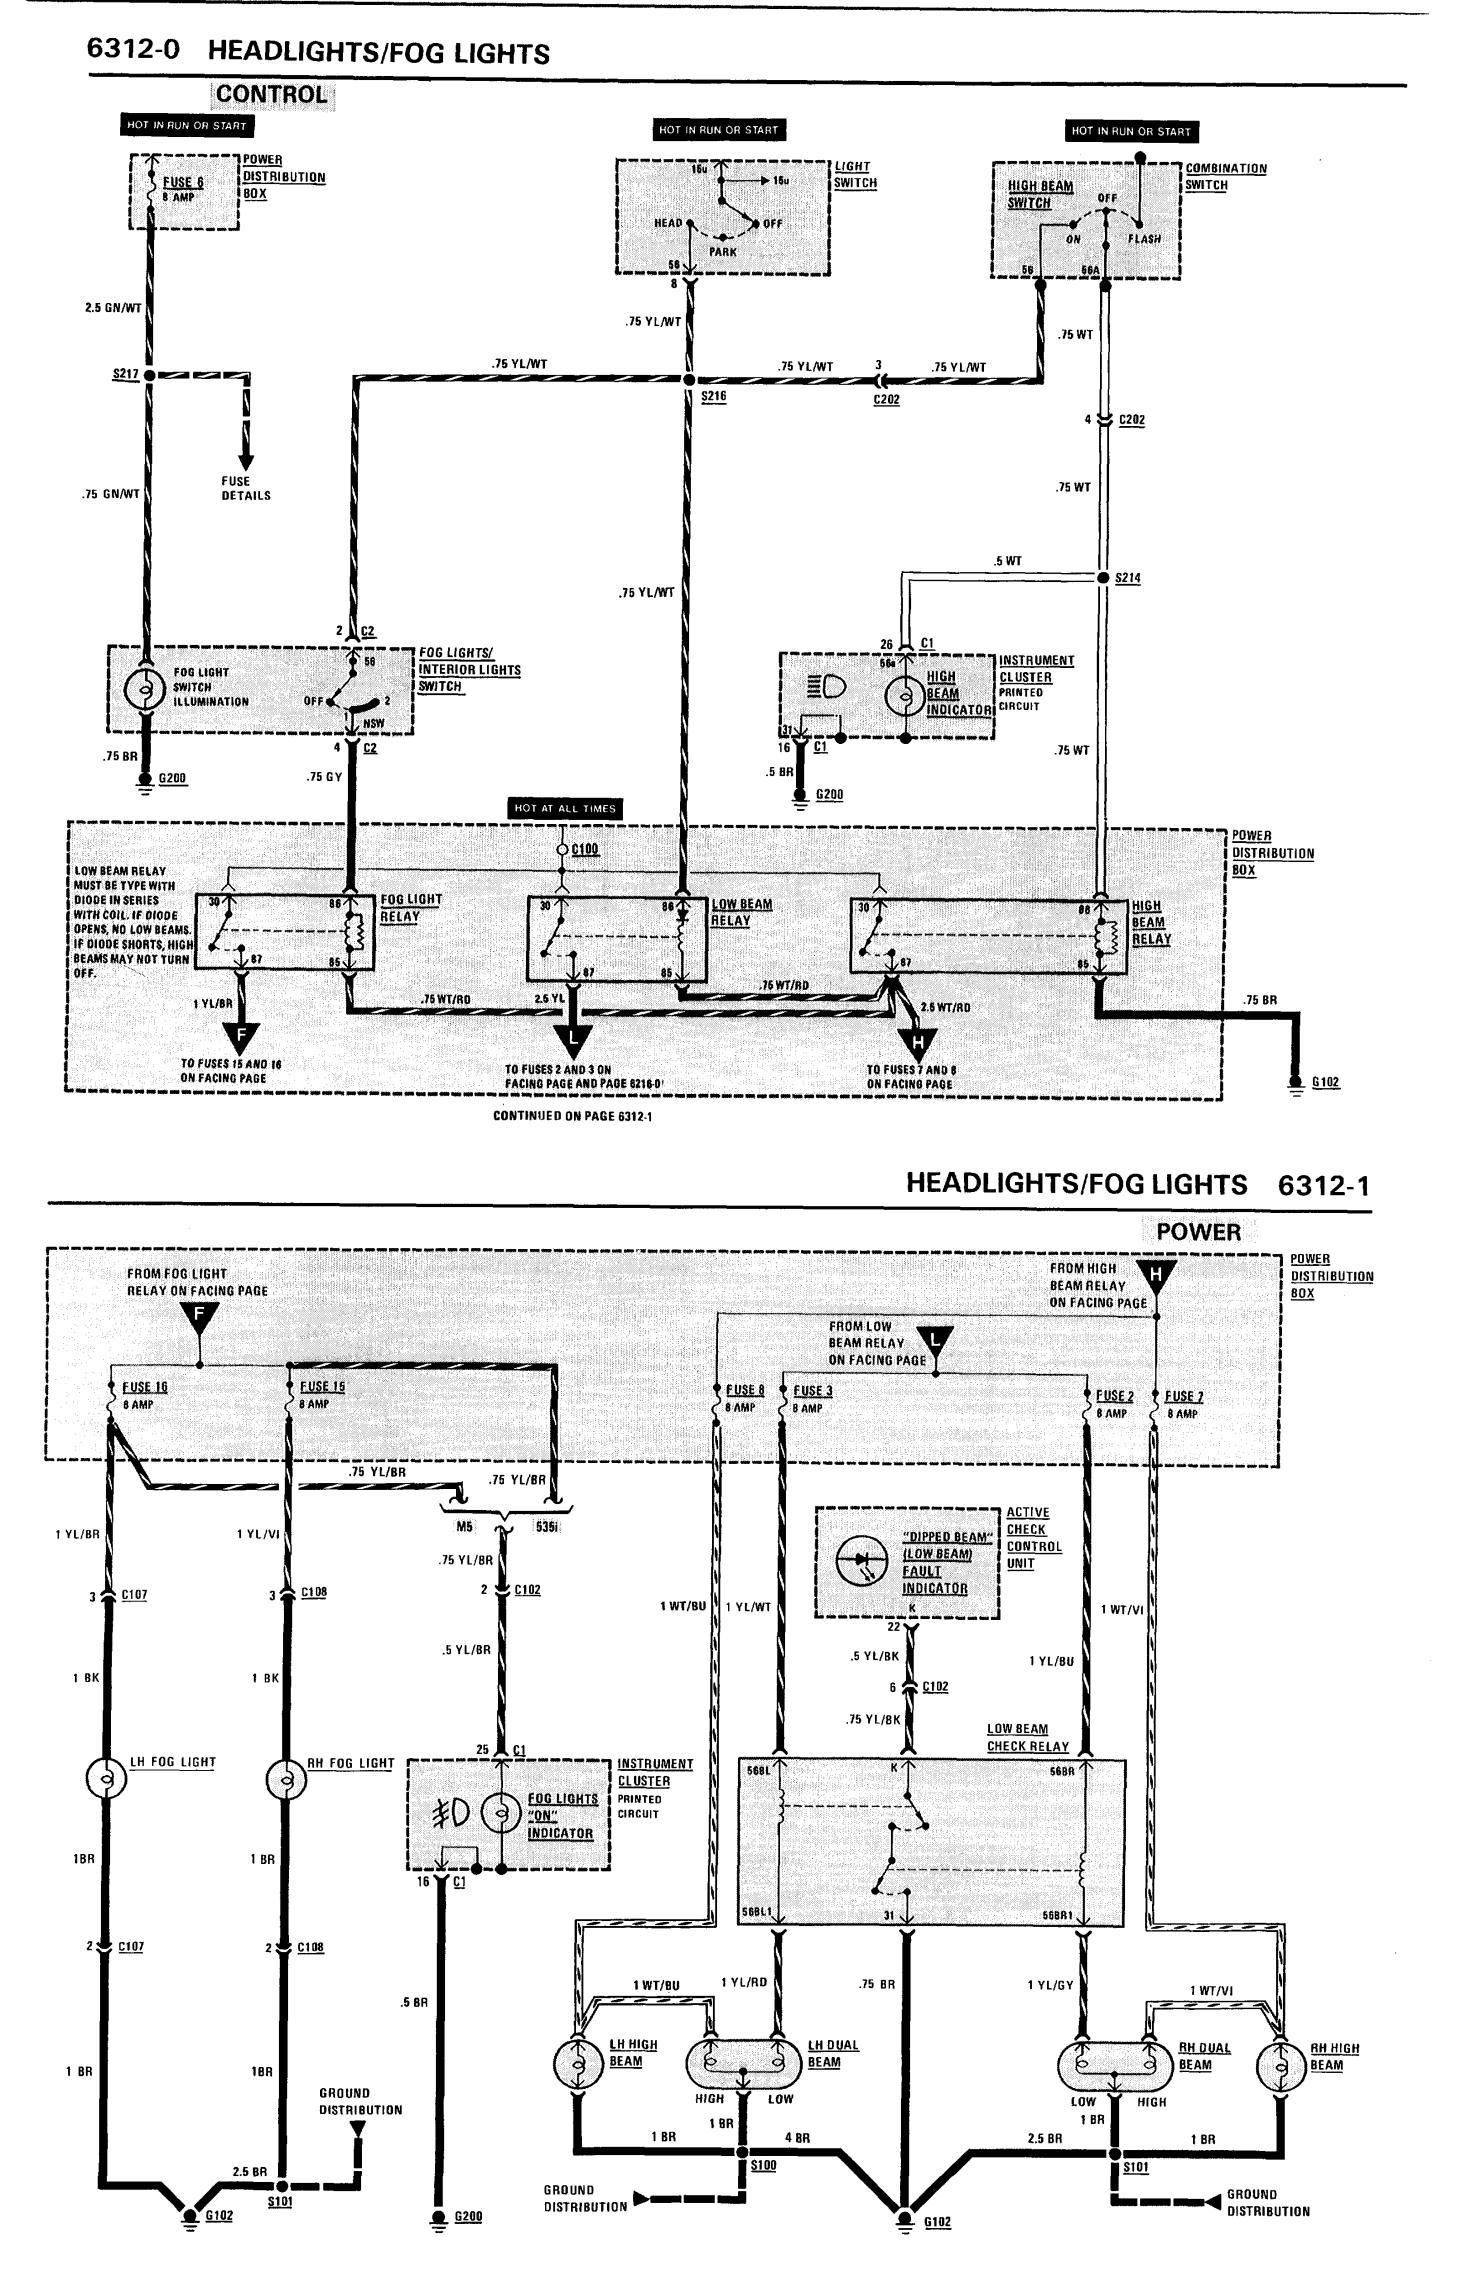 hight resolution of e28 fuse box diagram